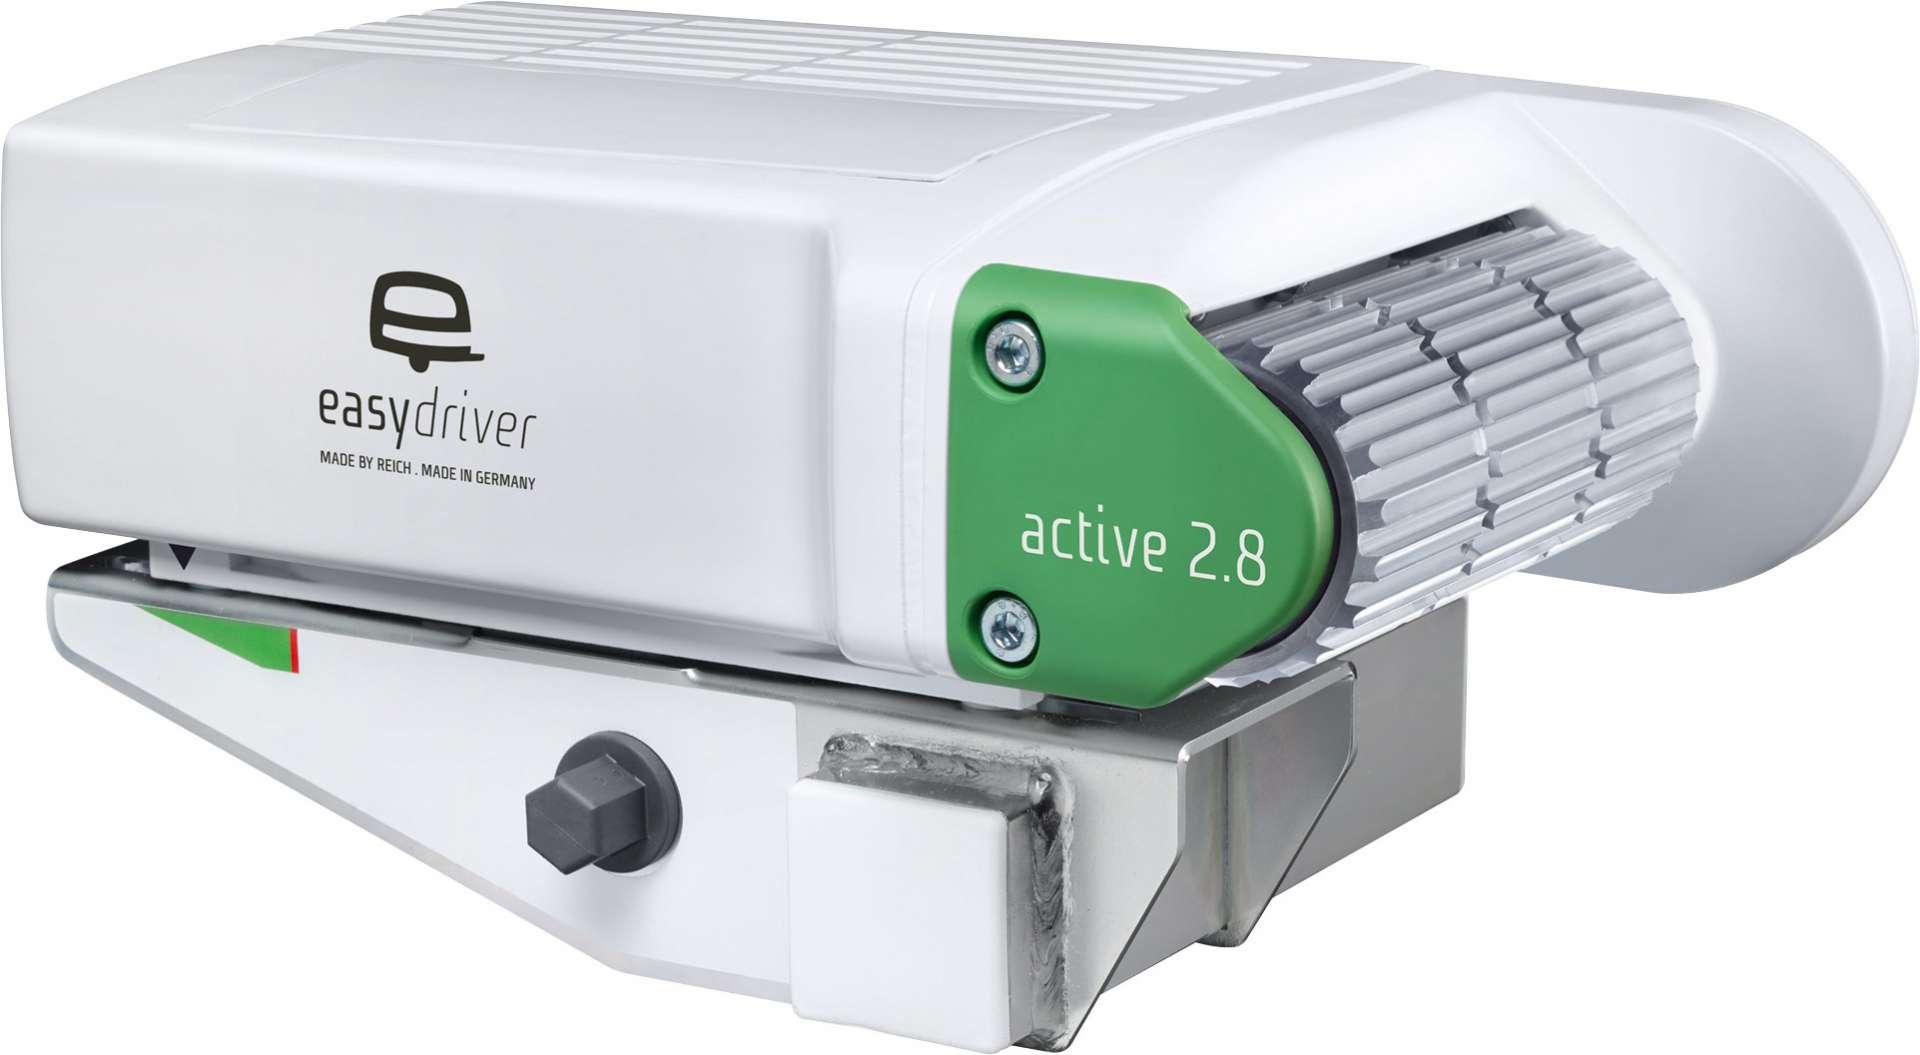 Reich Rangierhilfe EasyDriver Active 2.8 | 04037911272918